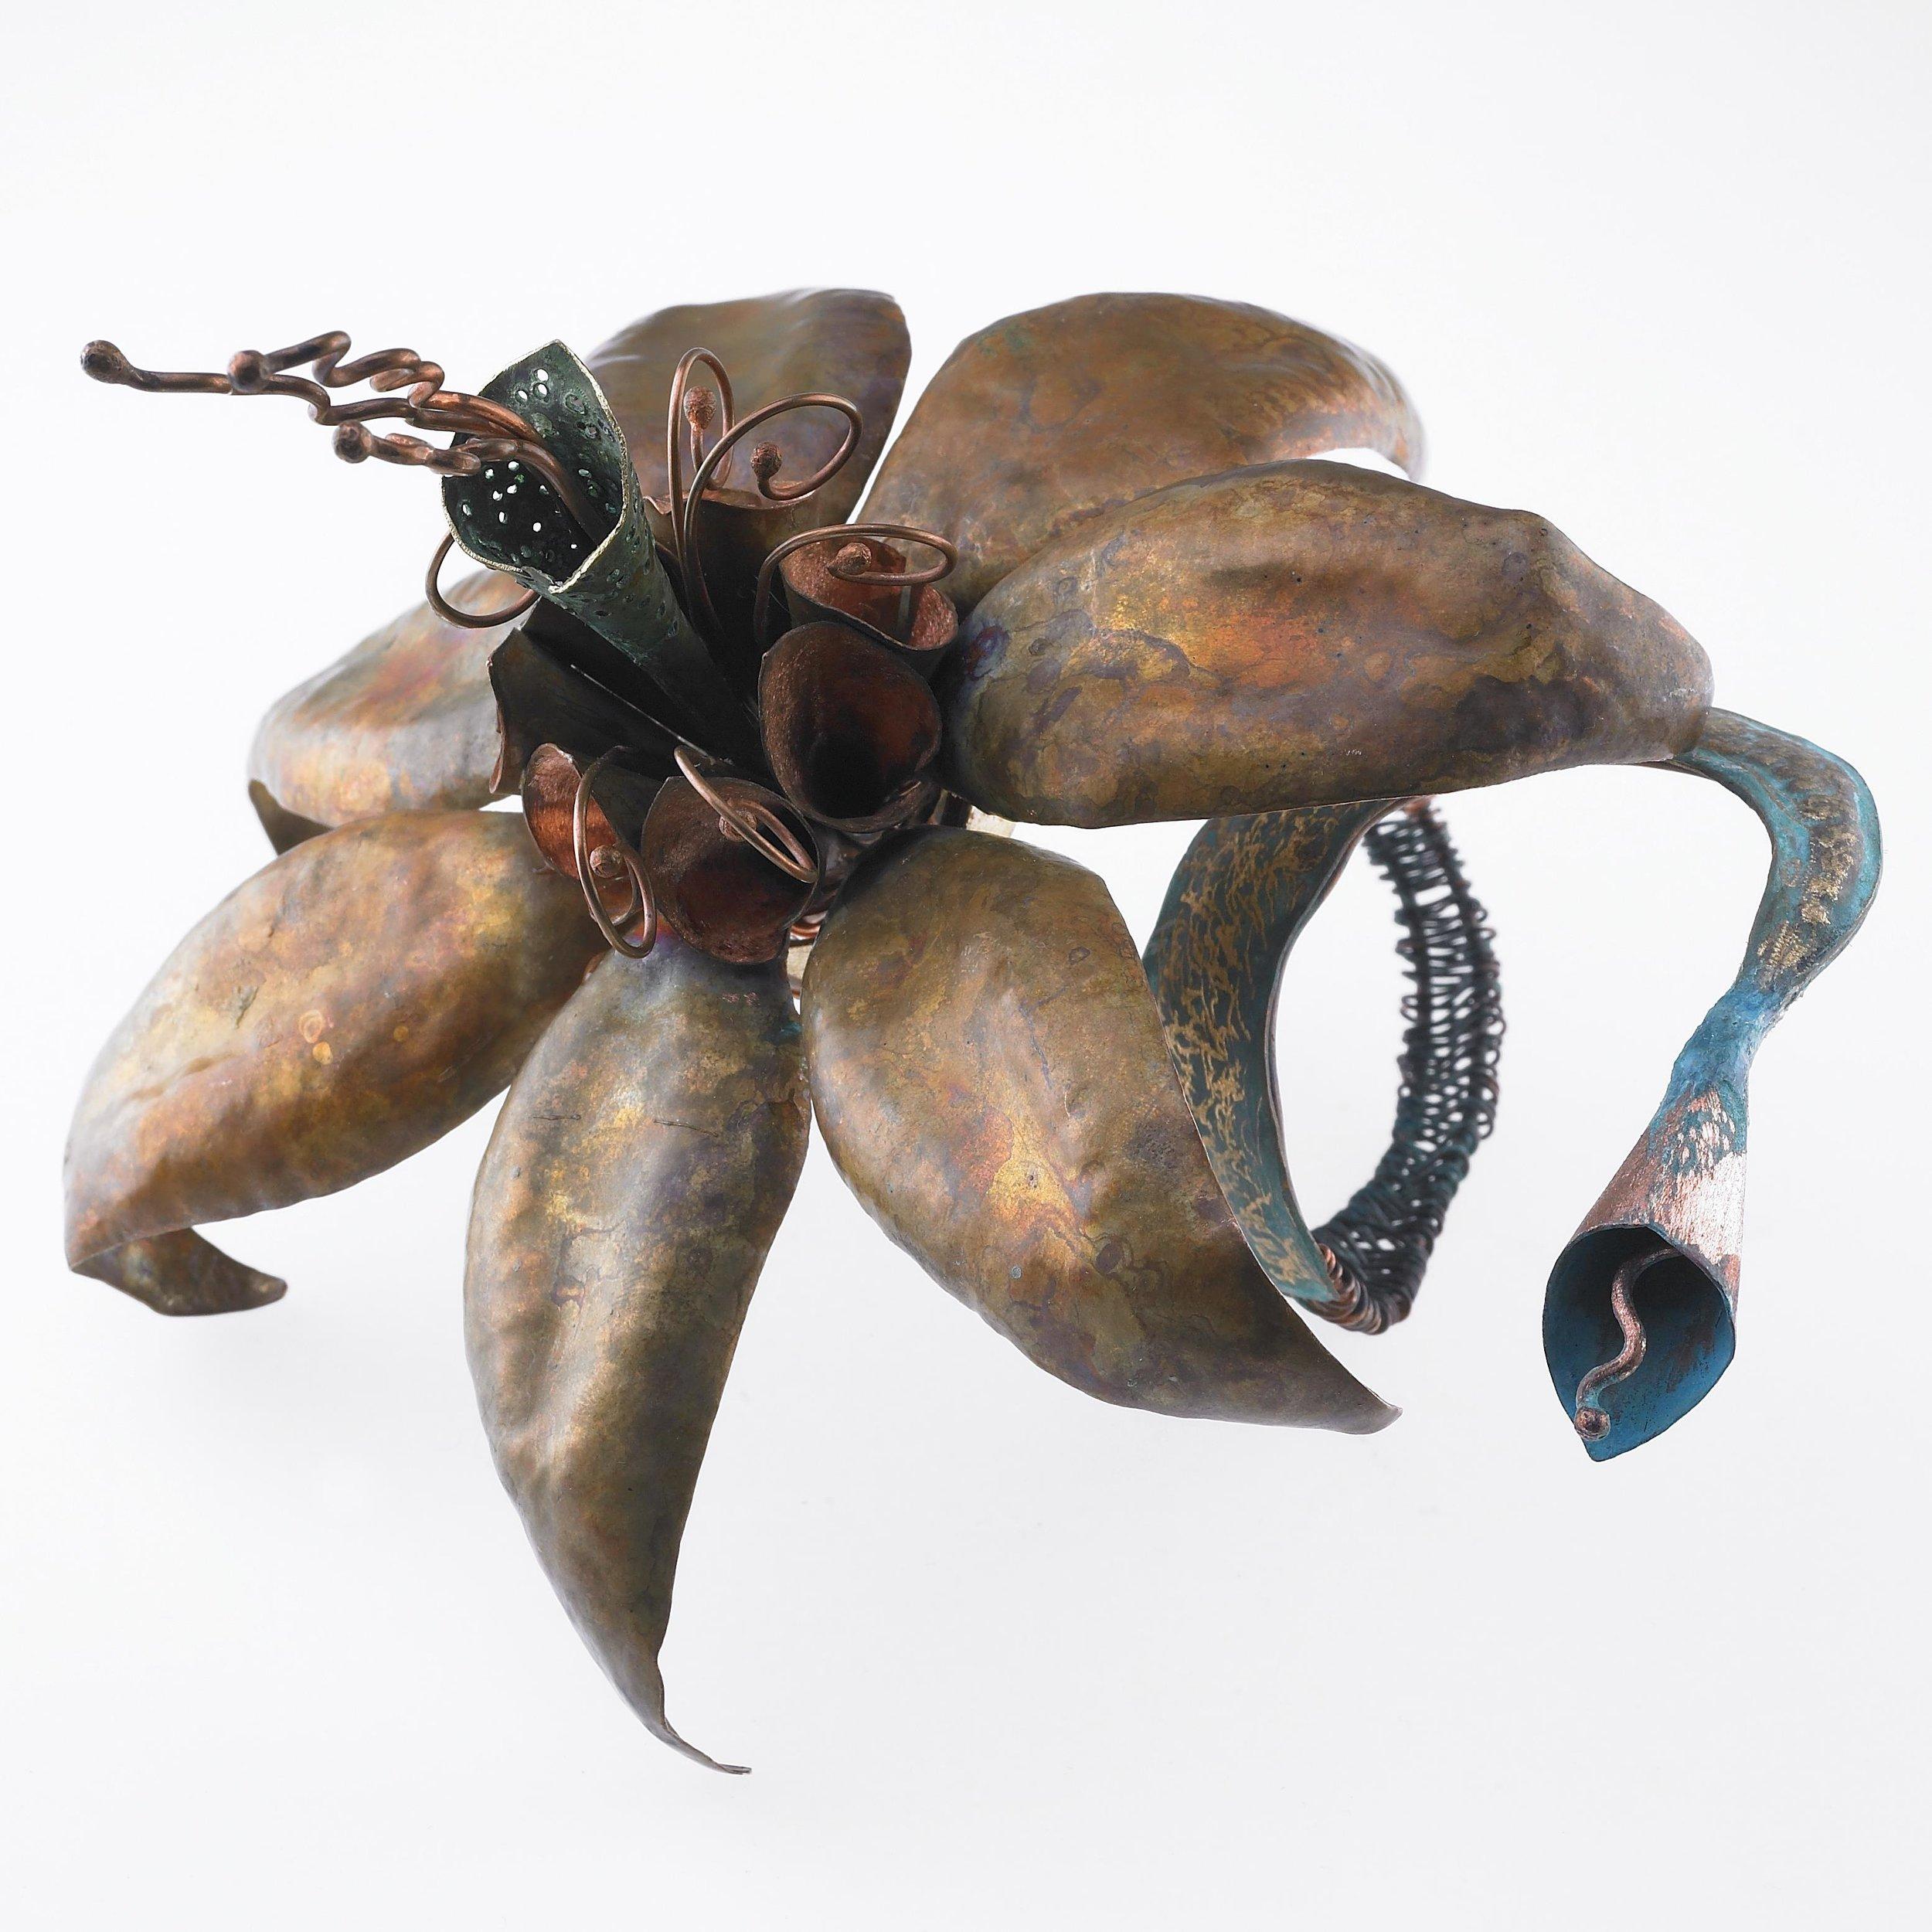 Finalist - Emerging Artist  Allison Cunniff  Barrington, IL, USA